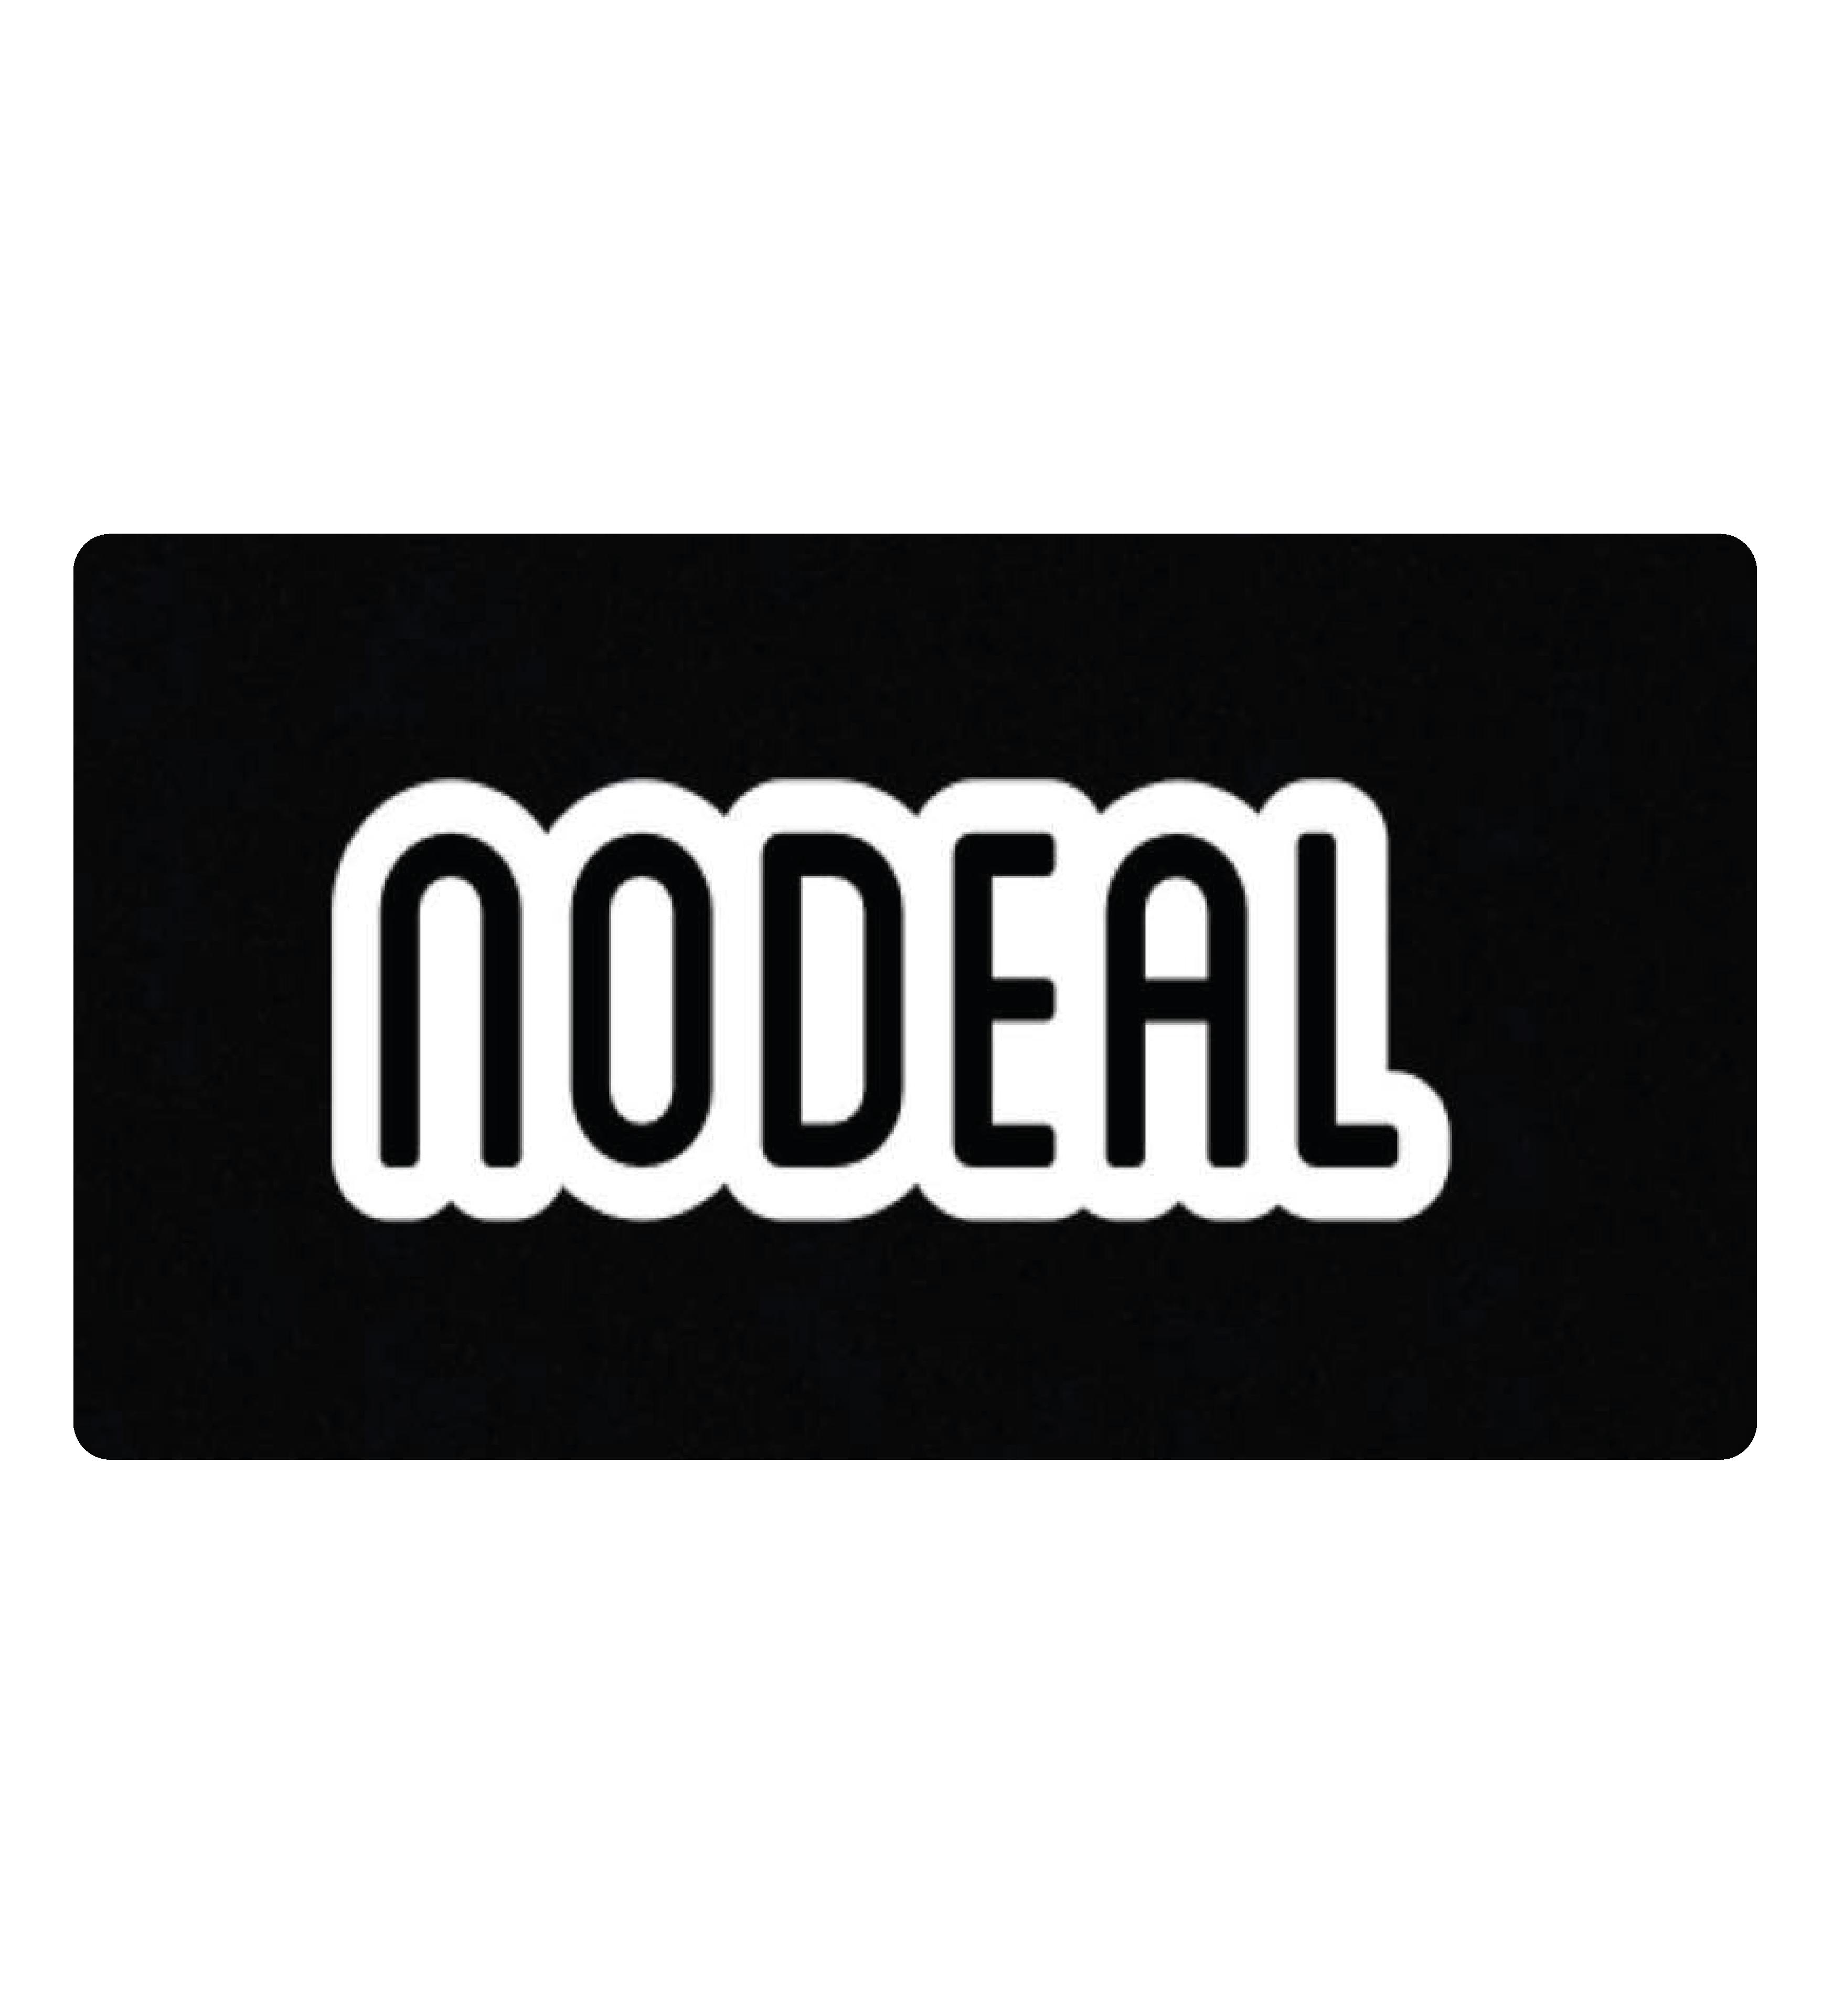 NO DEAL Clothing IP0230371-D